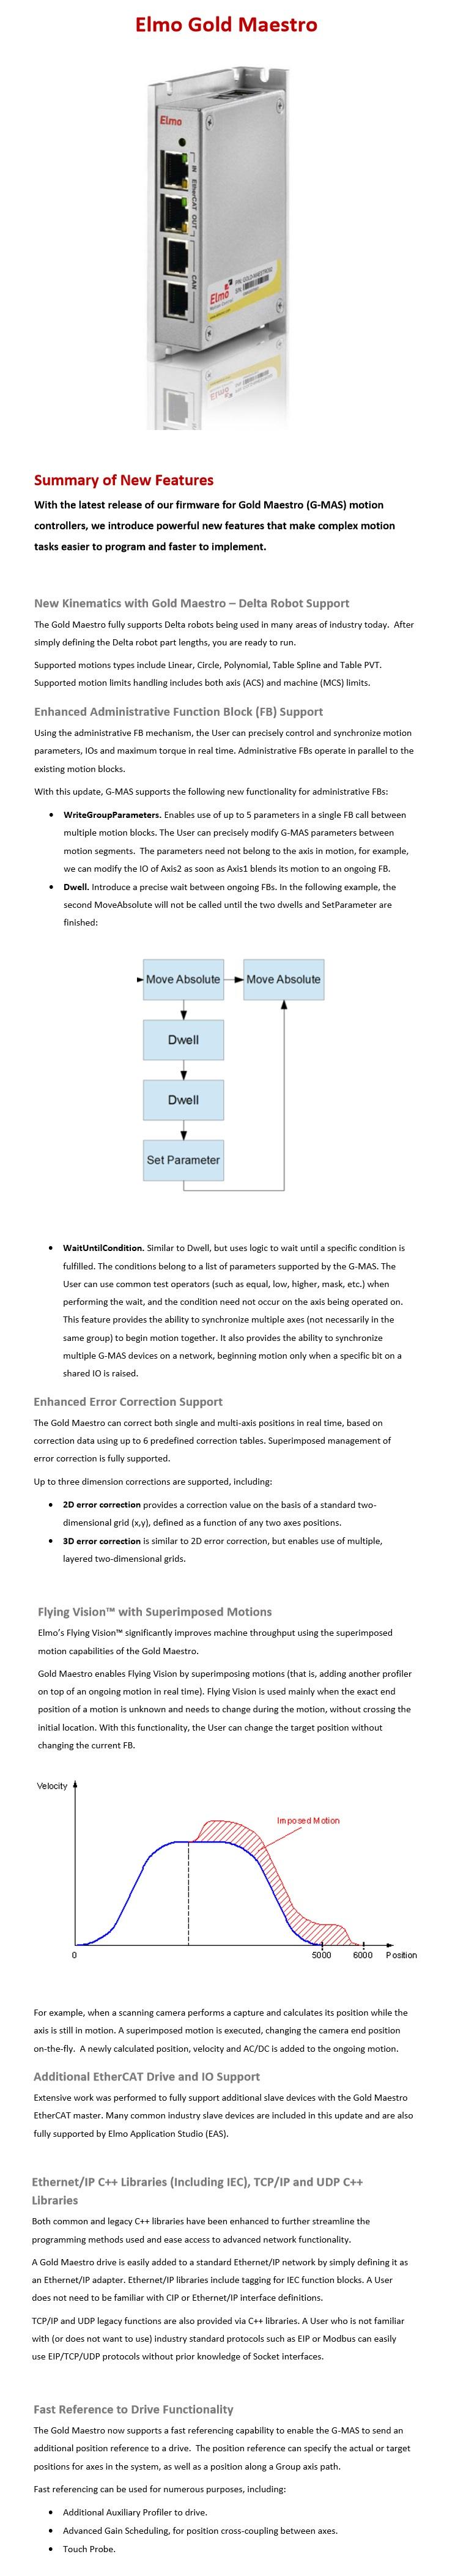 Elmo Motion Control: Motion Controller (Gold Maestro)